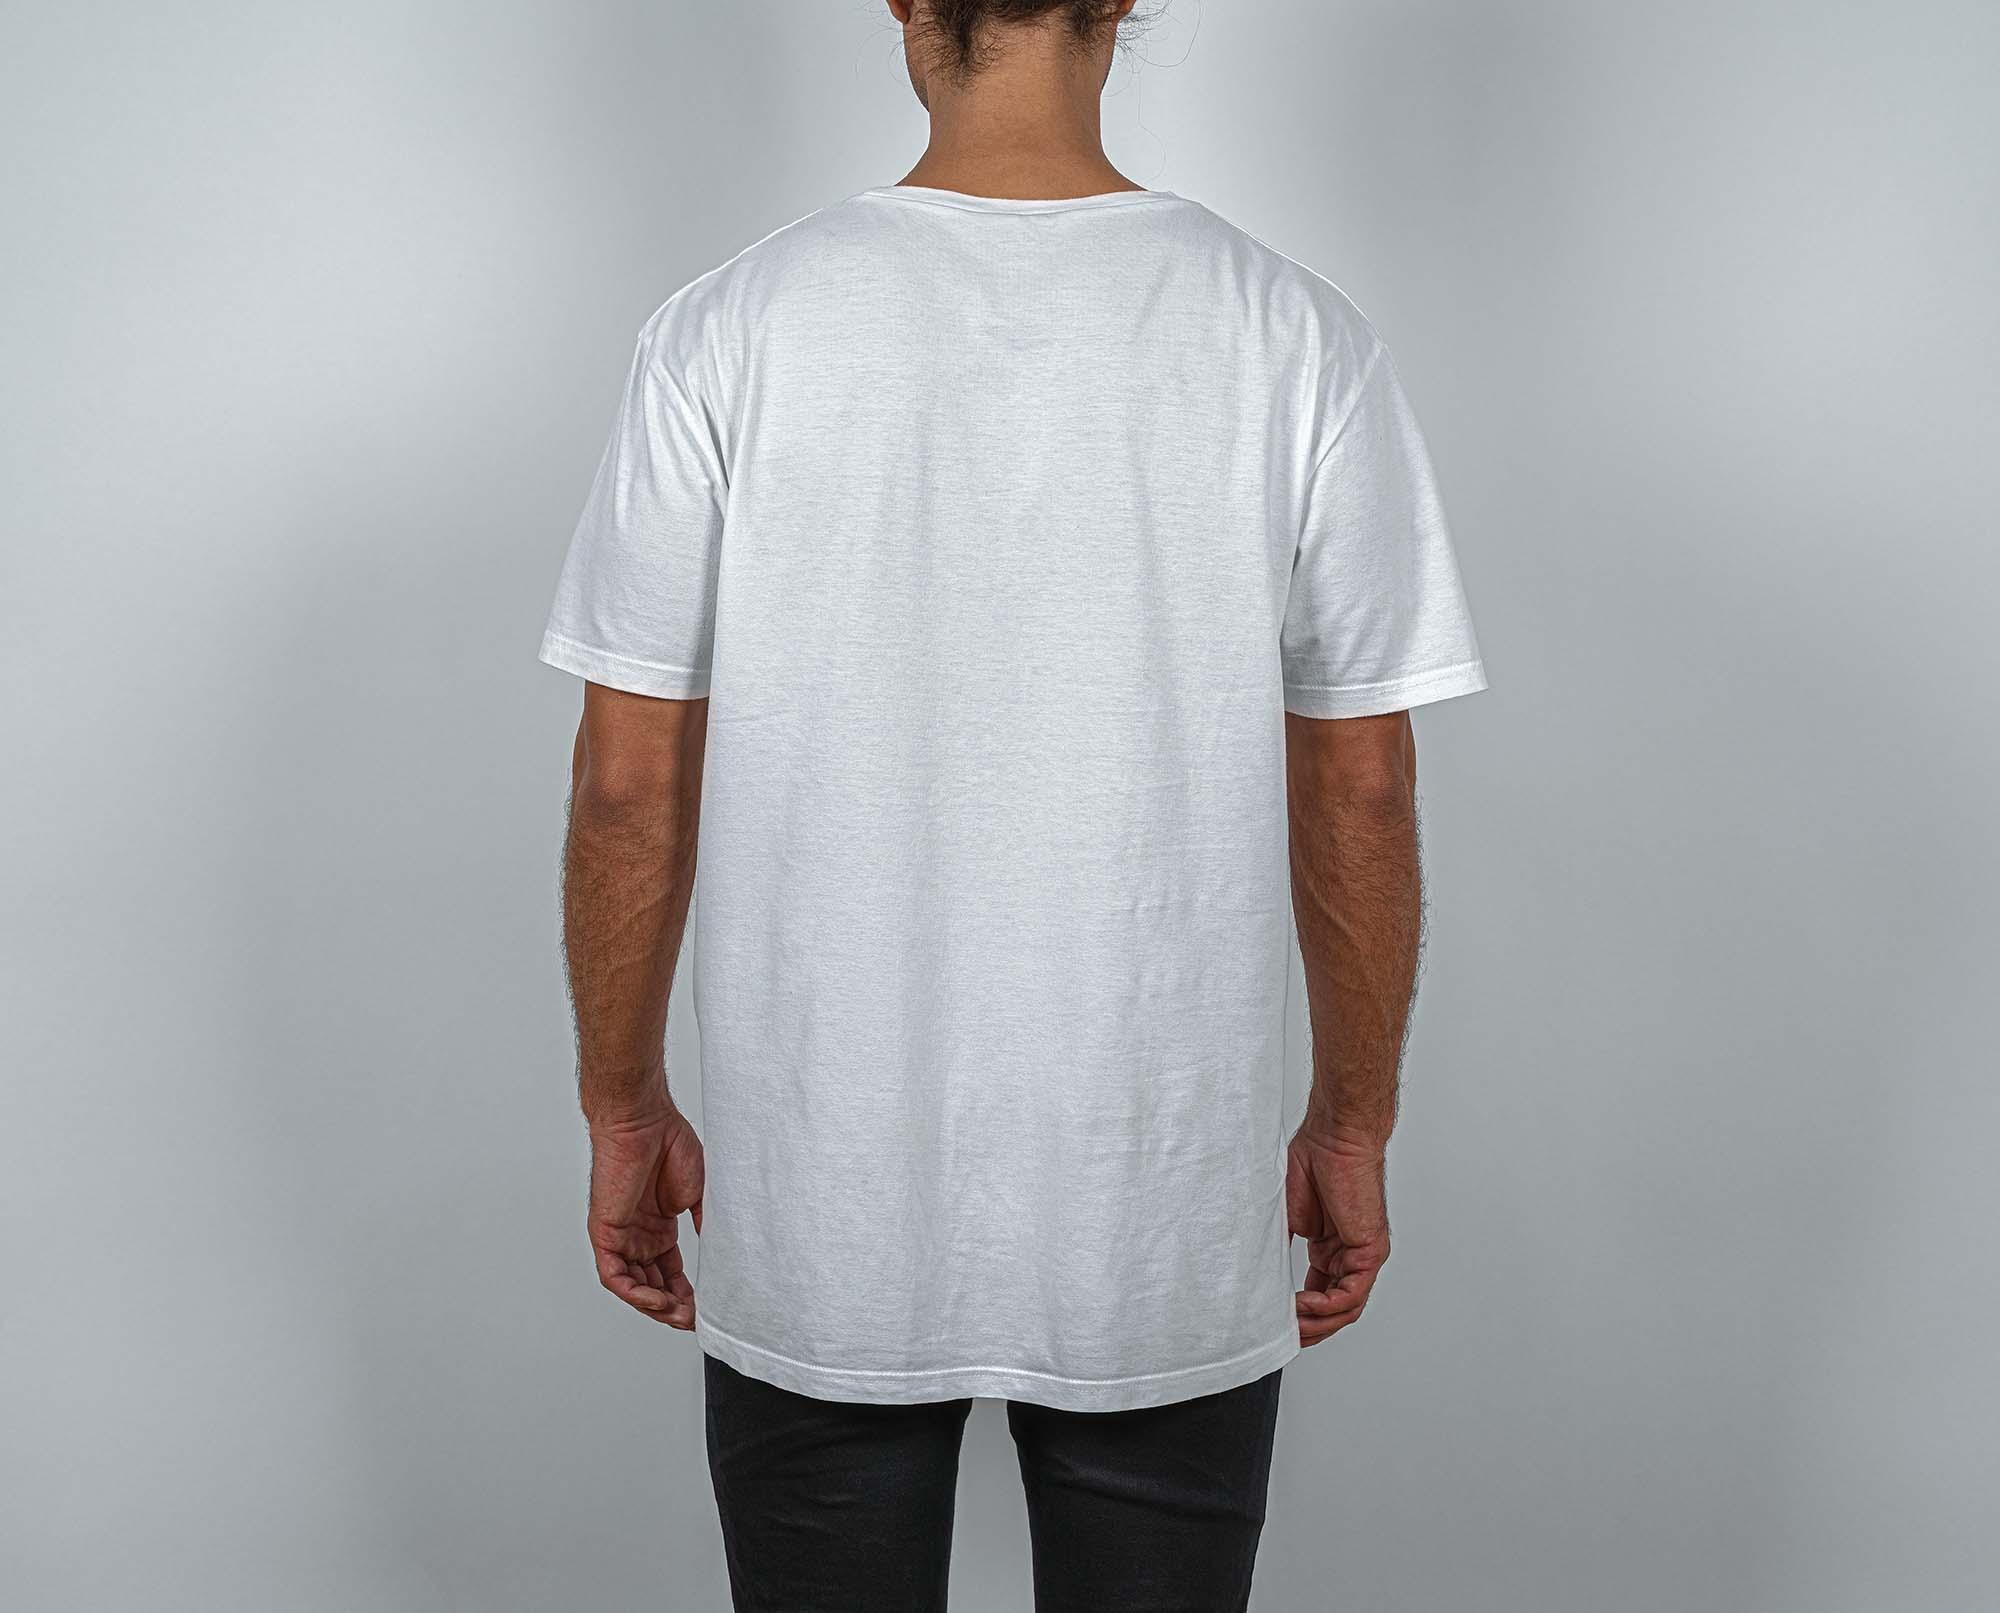 T-shirt Man Mockup 3